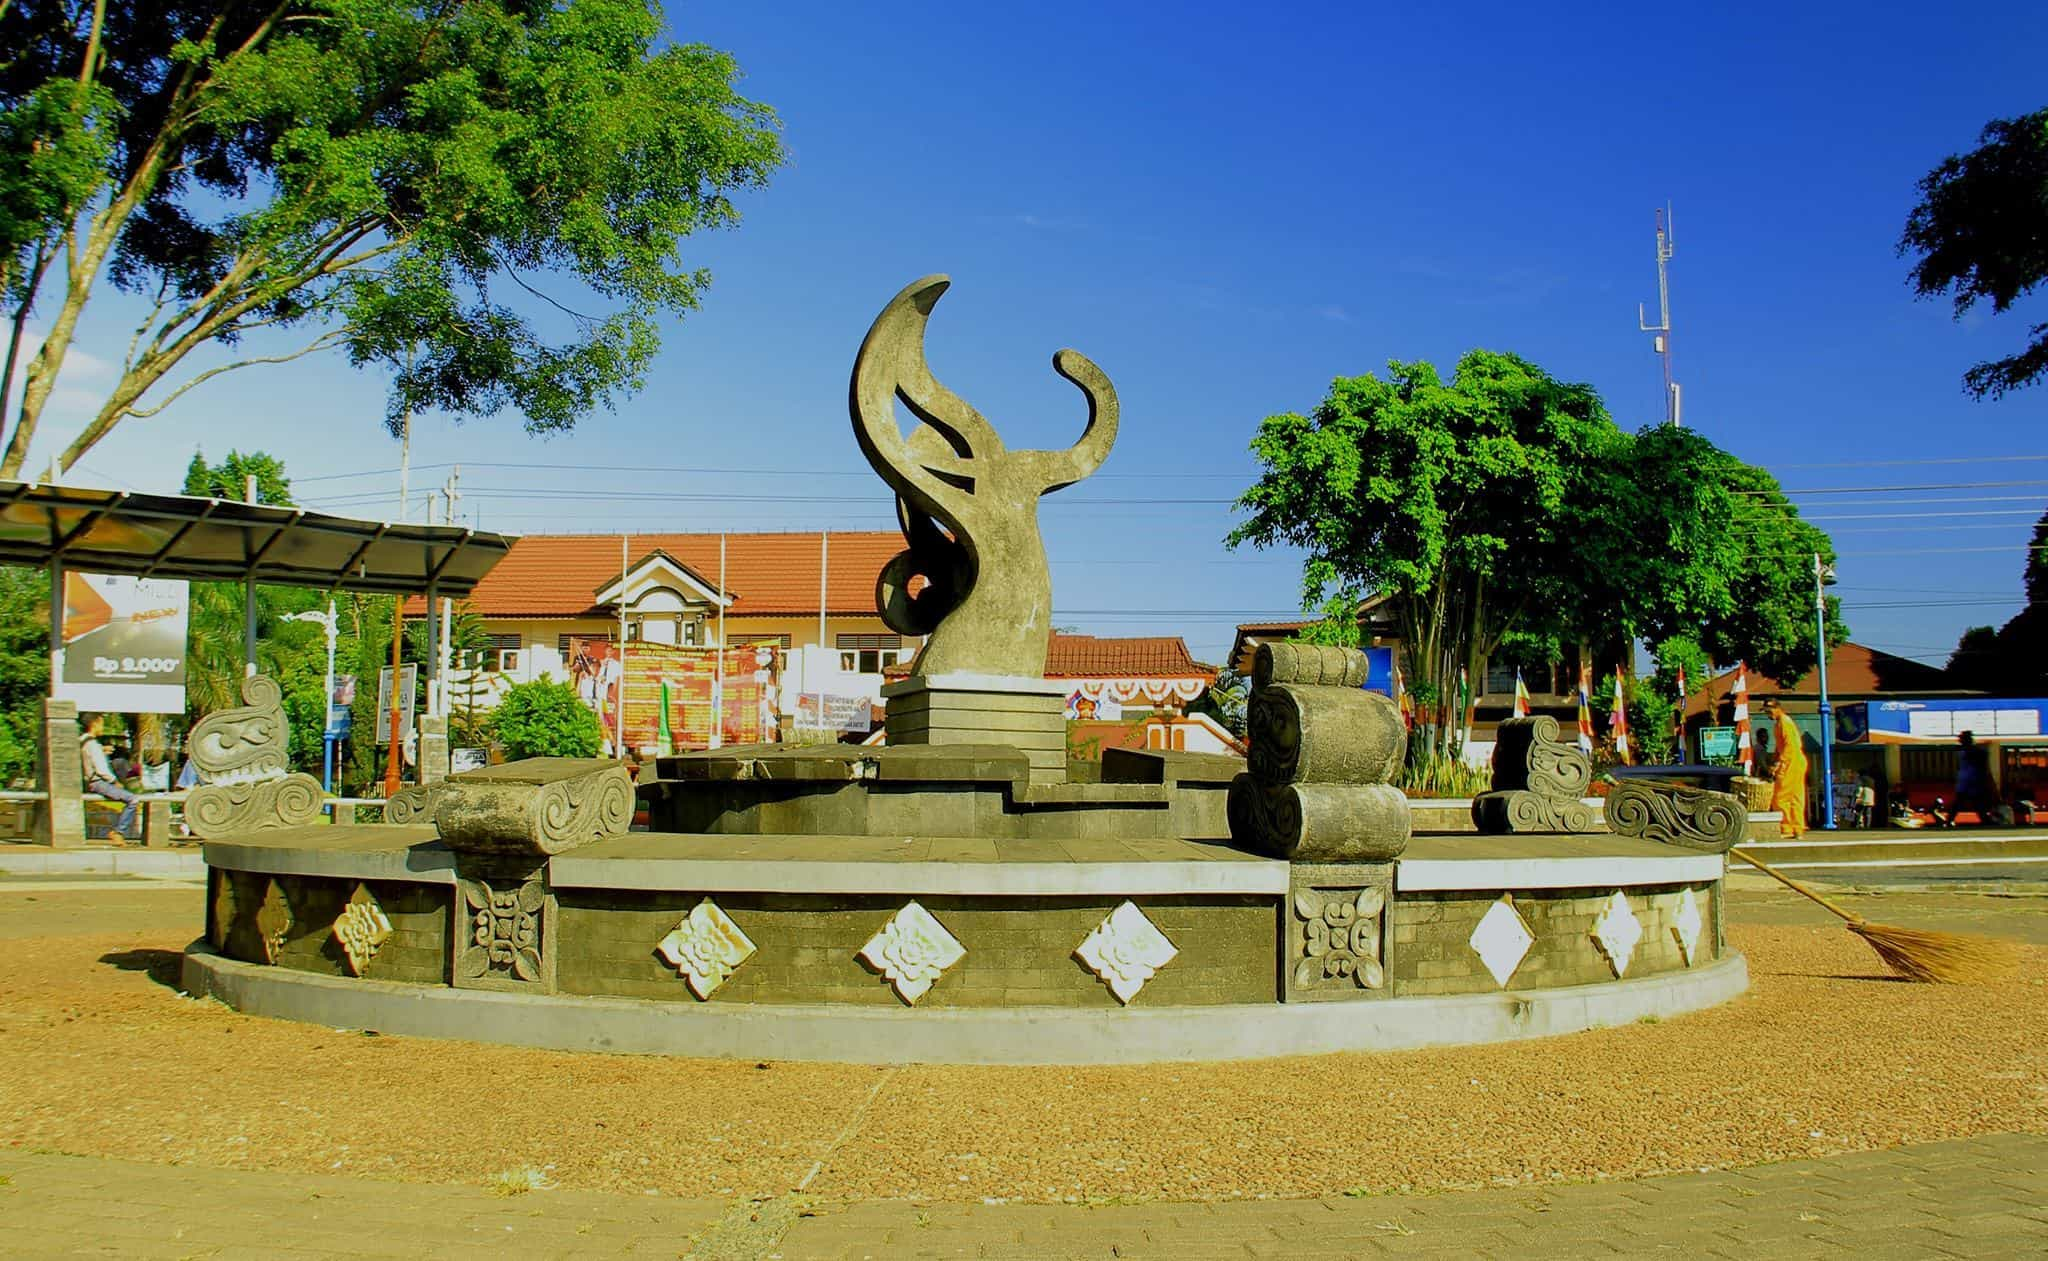 Inilah Objek Wisata Wonosobo Dieng Wajib Dikunjungi Alun Kab